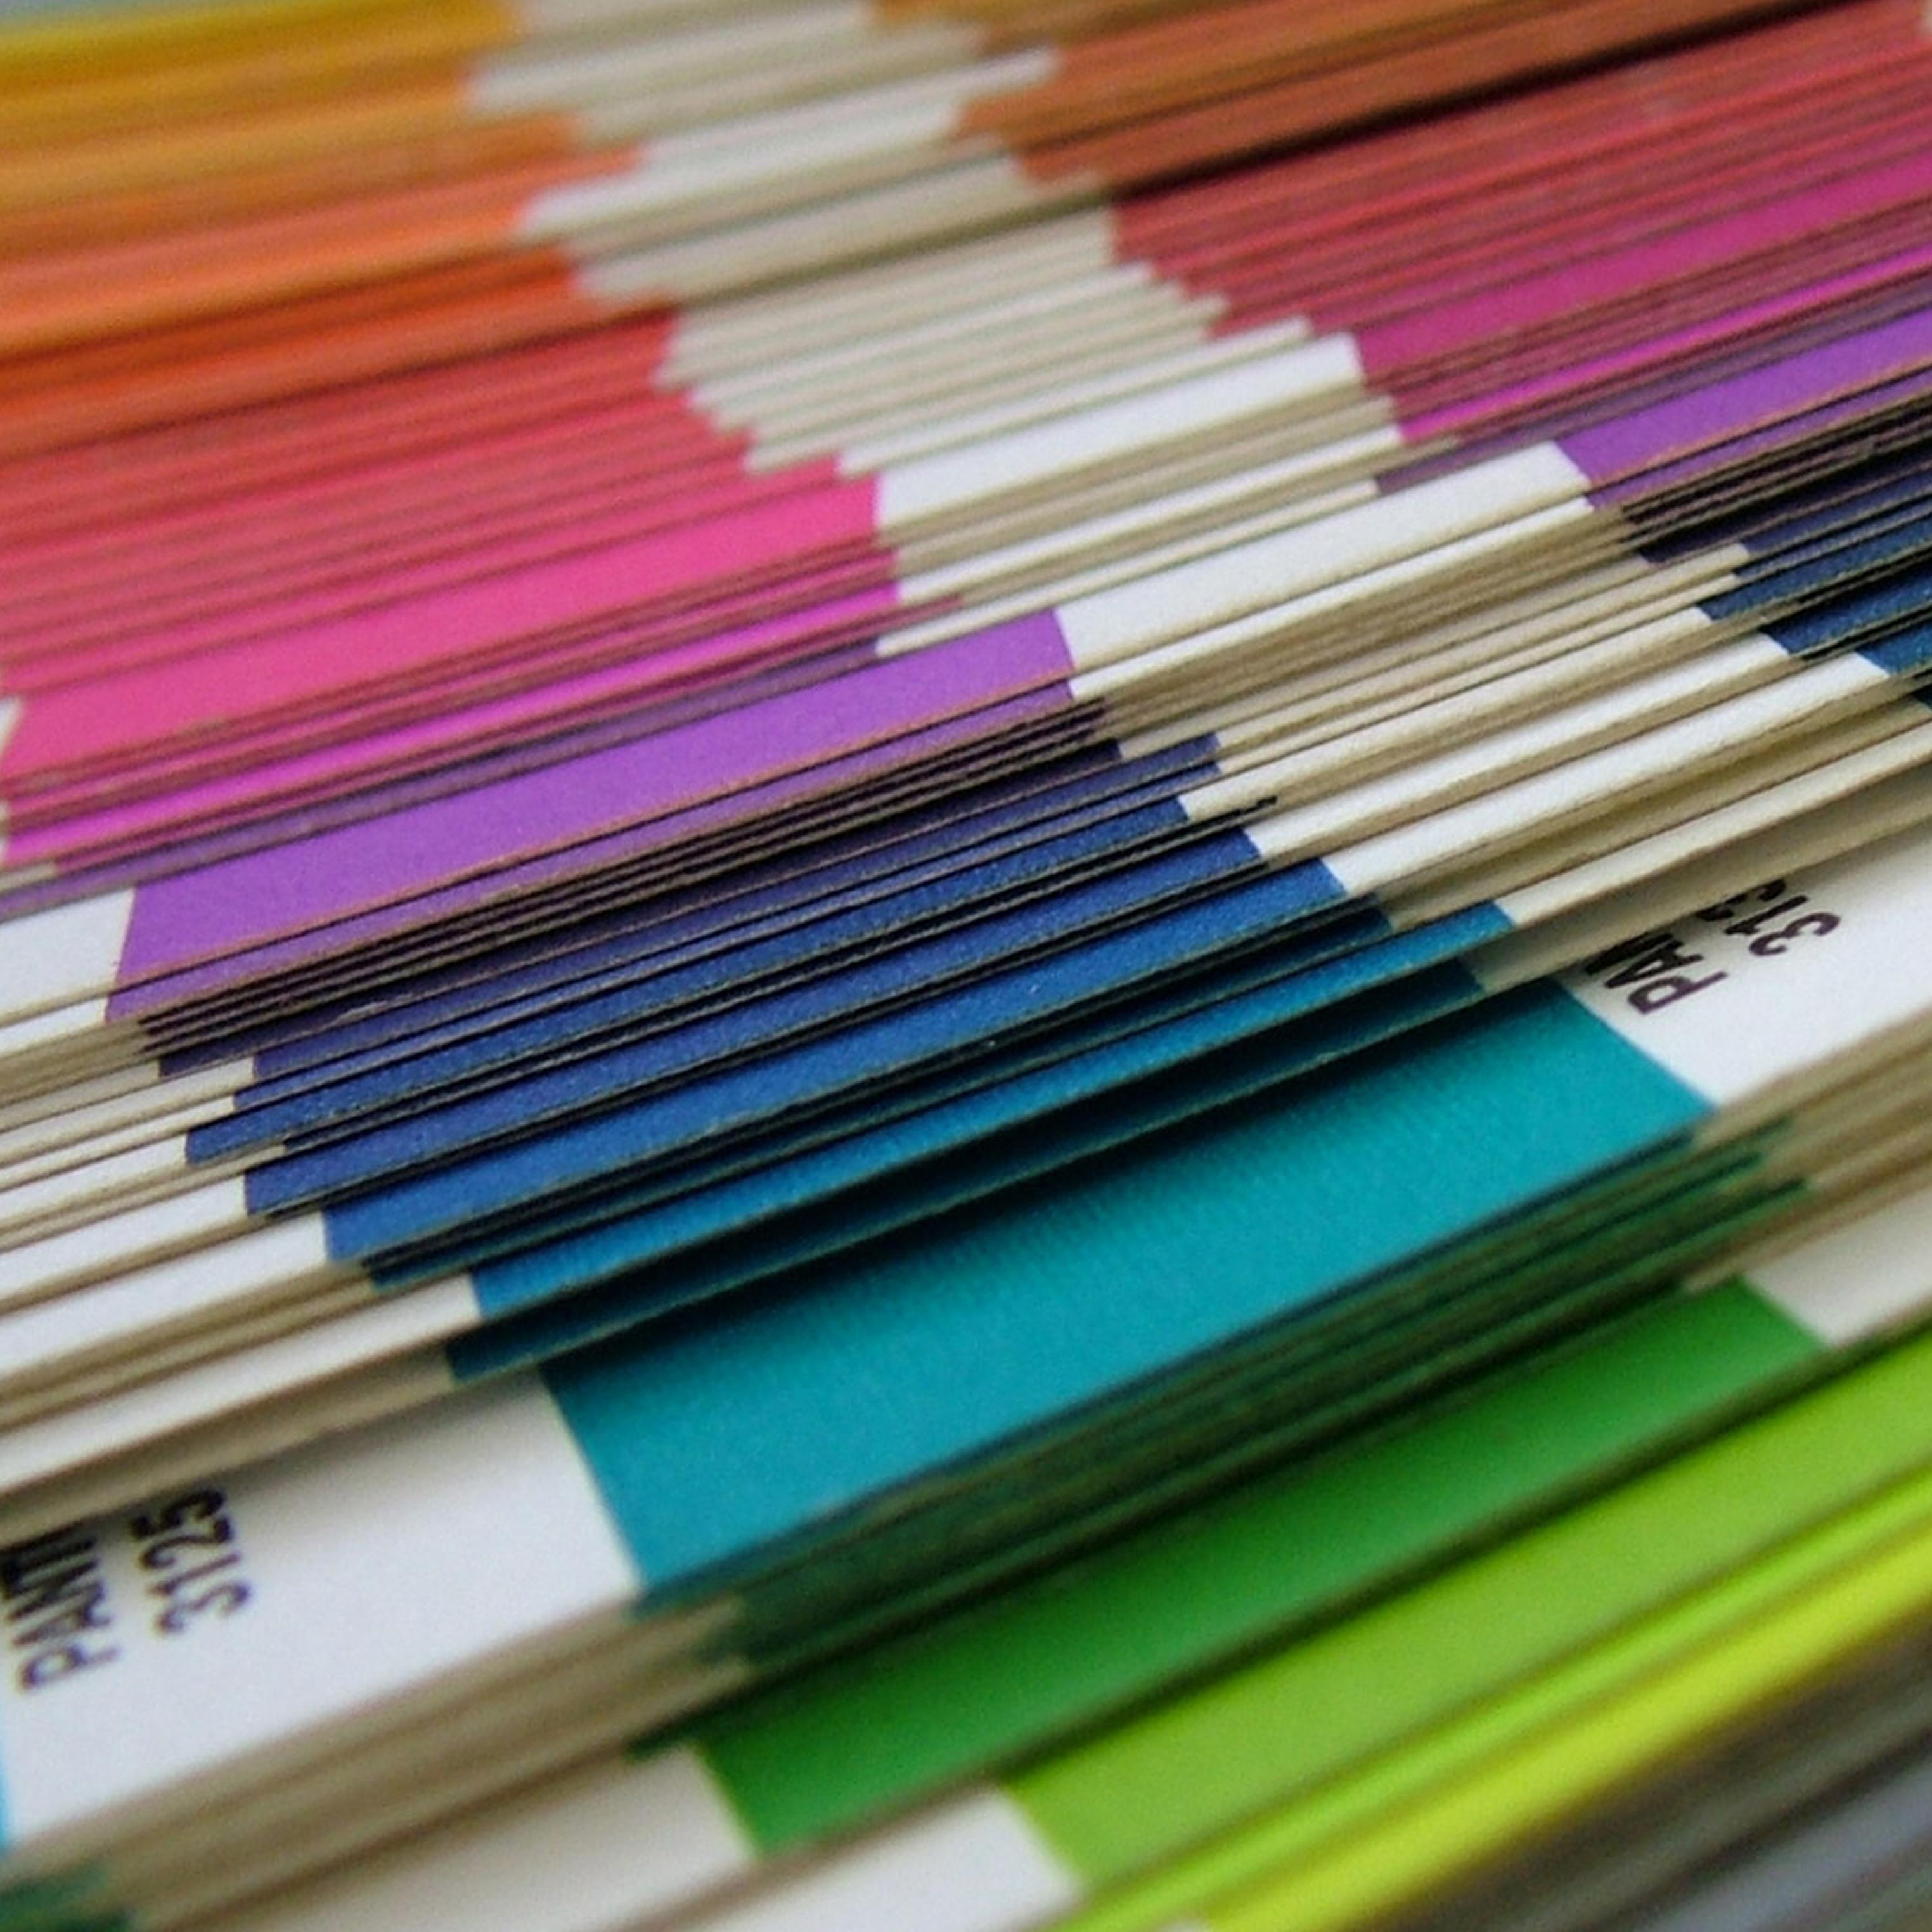 5 Pantone Colors To Avoid On Screen Printed Shirts Eco Print Lab